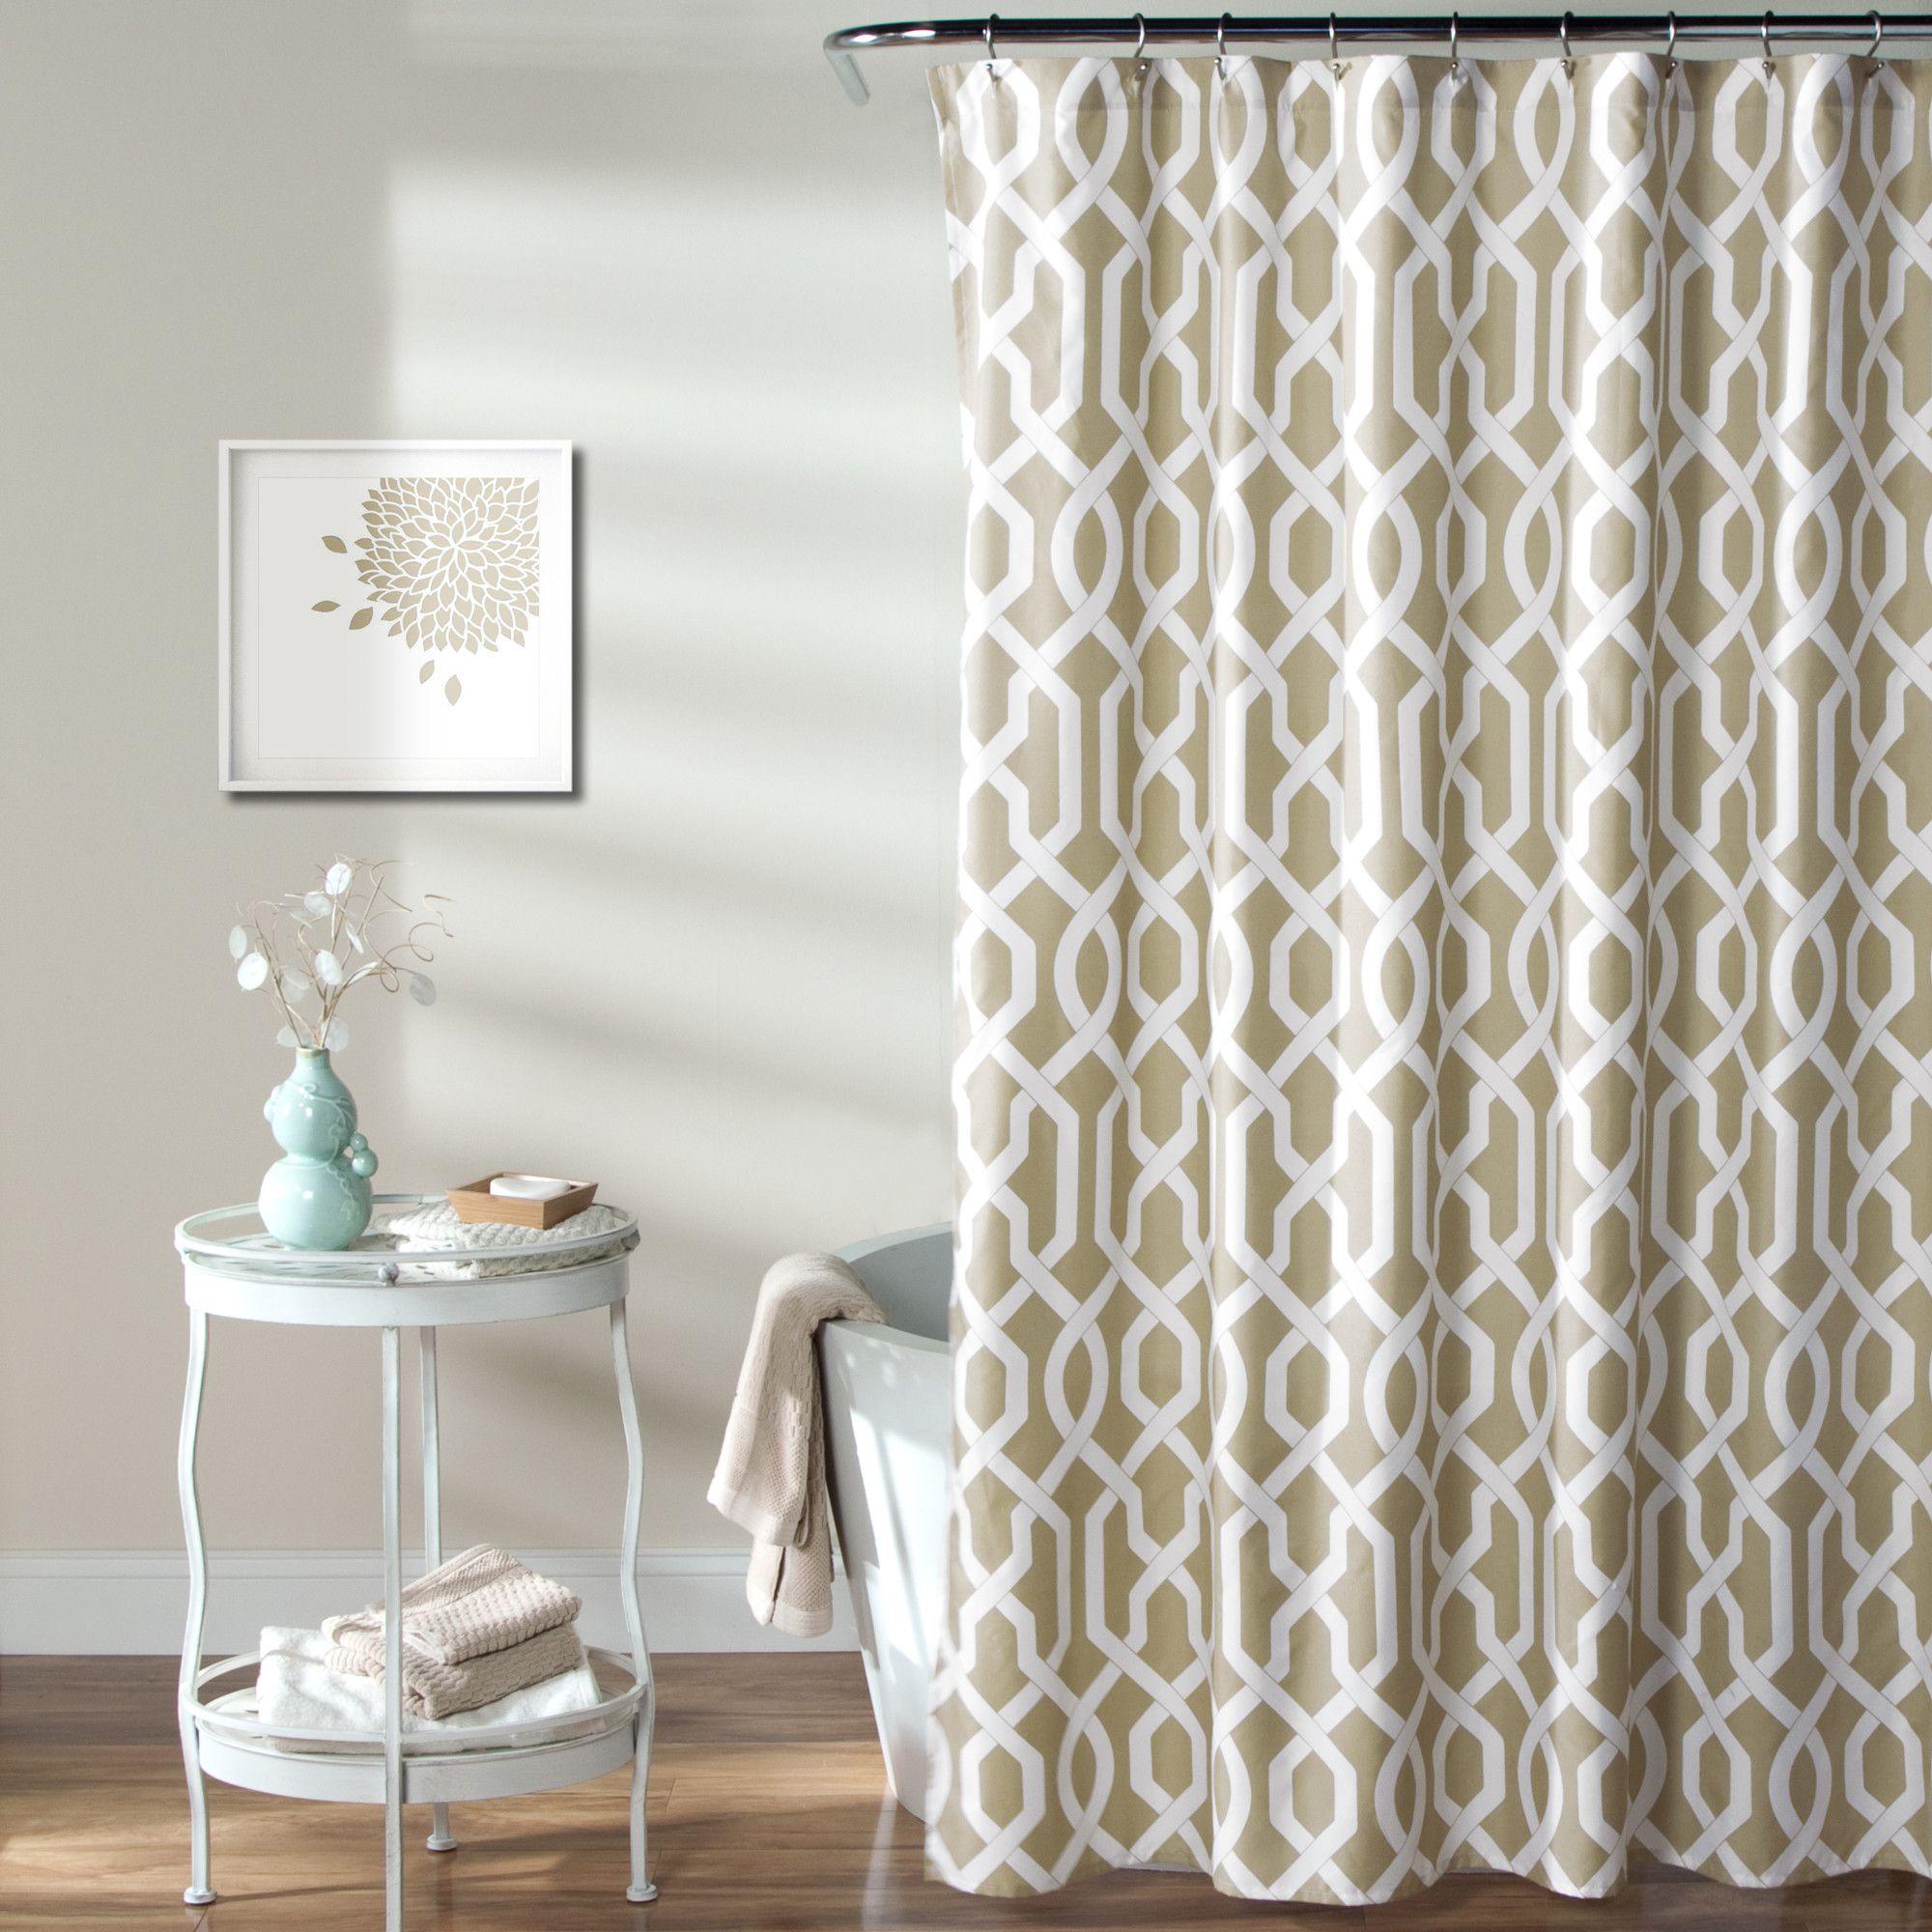 Special Edition By Lush Decor Edward Trellis Shower Curtain